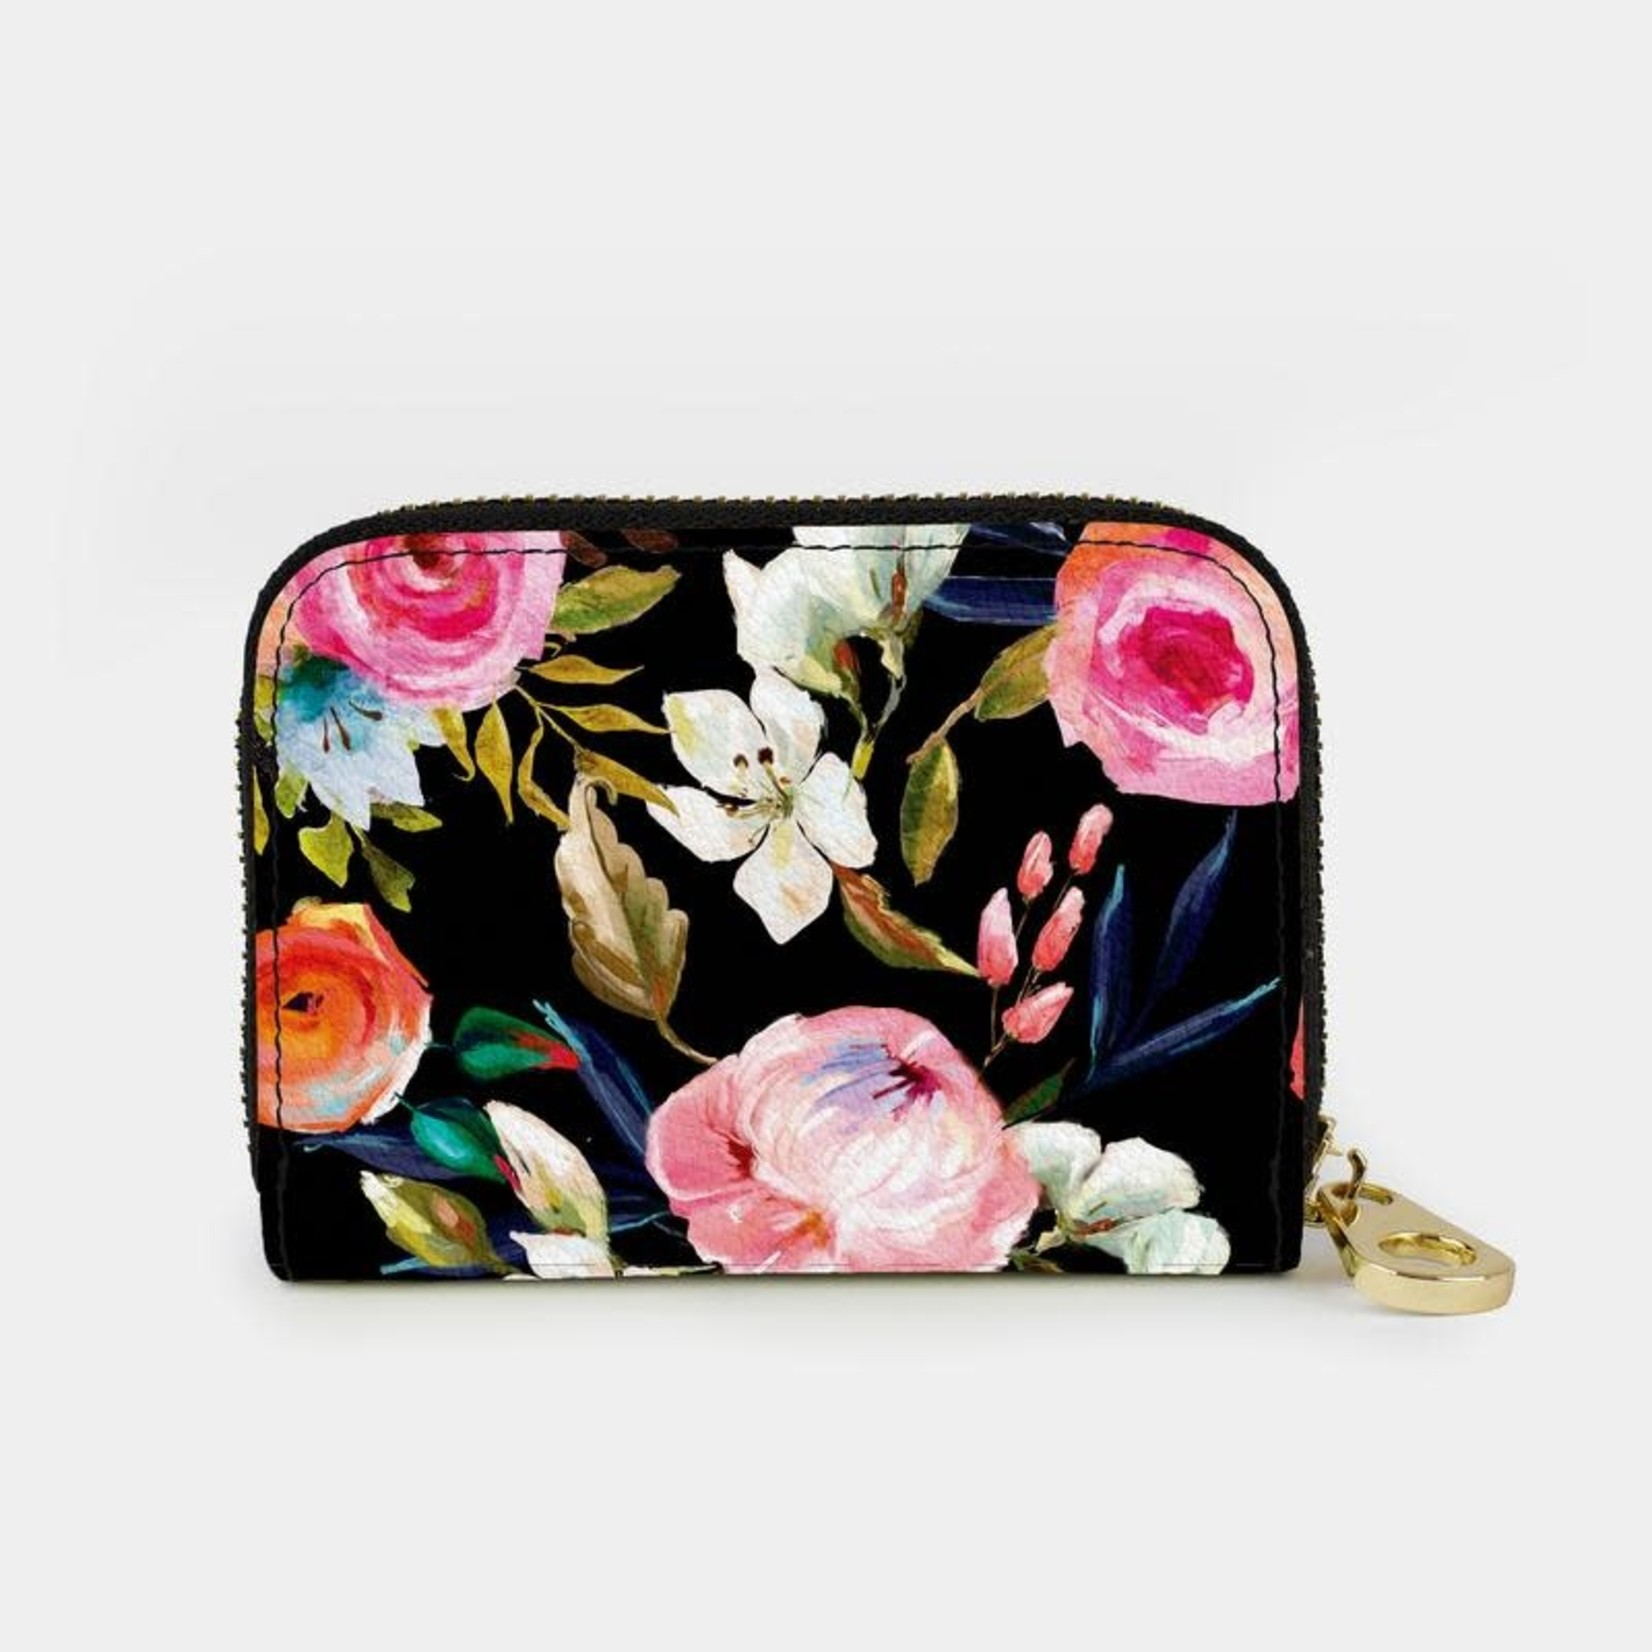 Monarque Zippered Wallet - Florals on Black